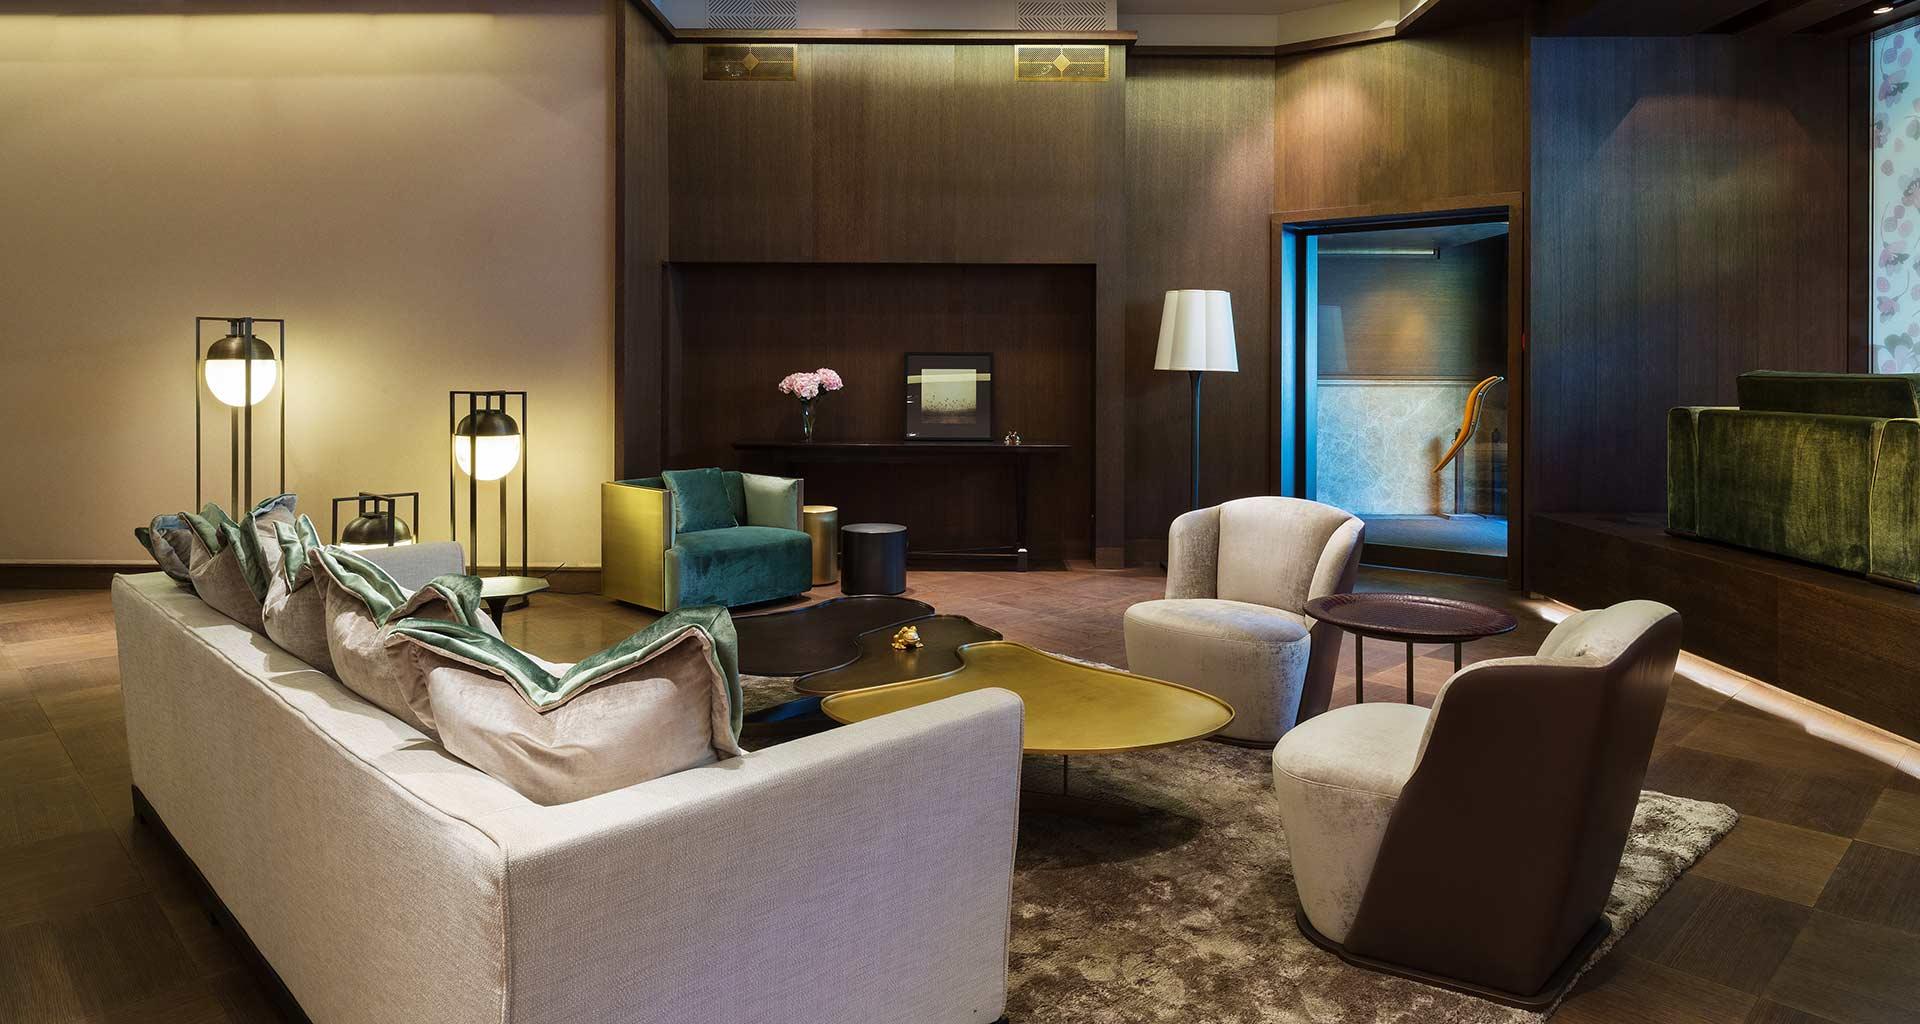 Living room in Promemoria's single-brand showroom in Moscow | Promemoria